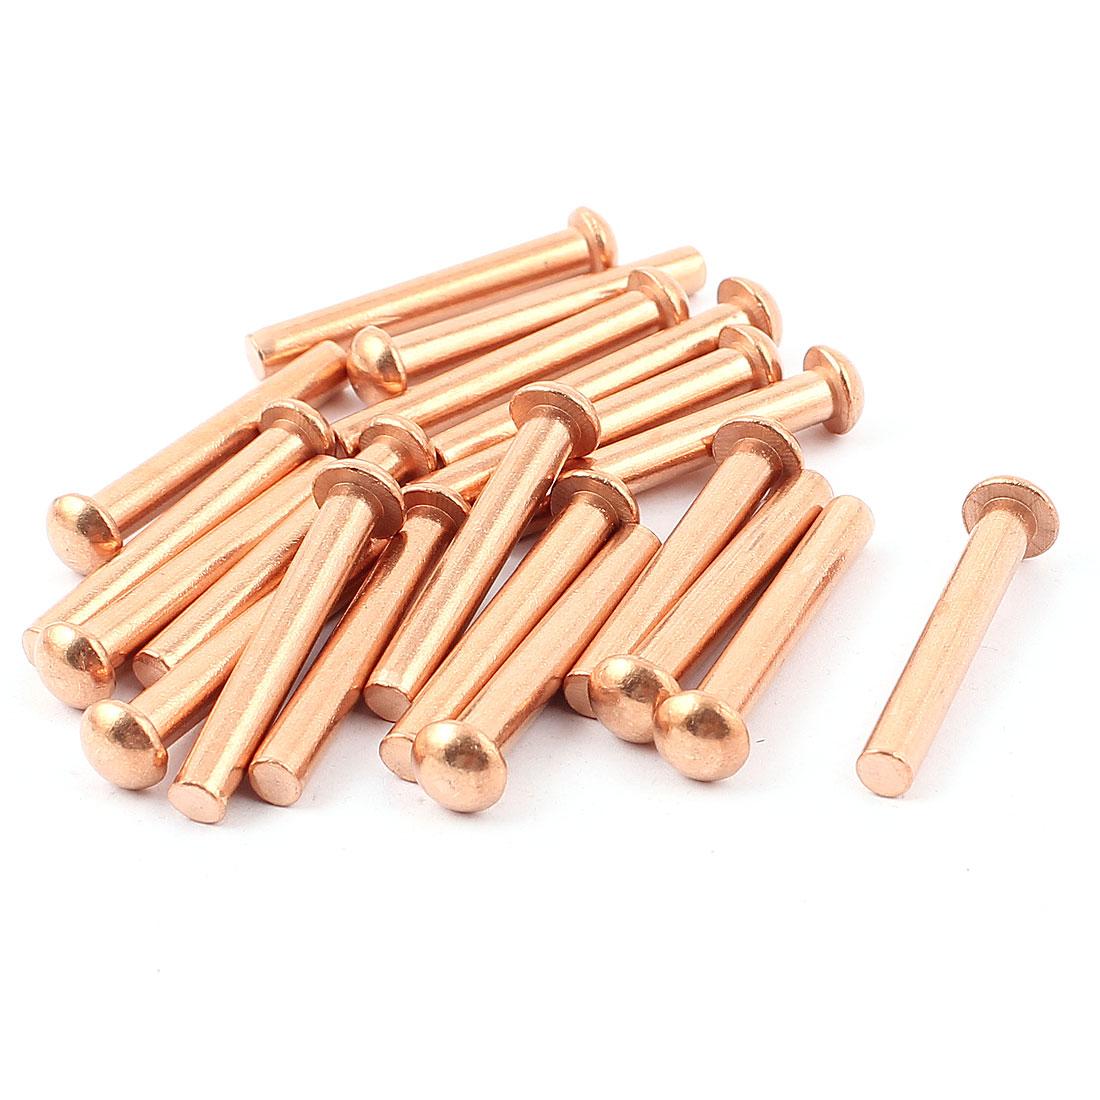 "20 Pcs 3/16"" Diameter 1 3/8"" L Shank Round Head Copper Solid Rivets Fasteners"